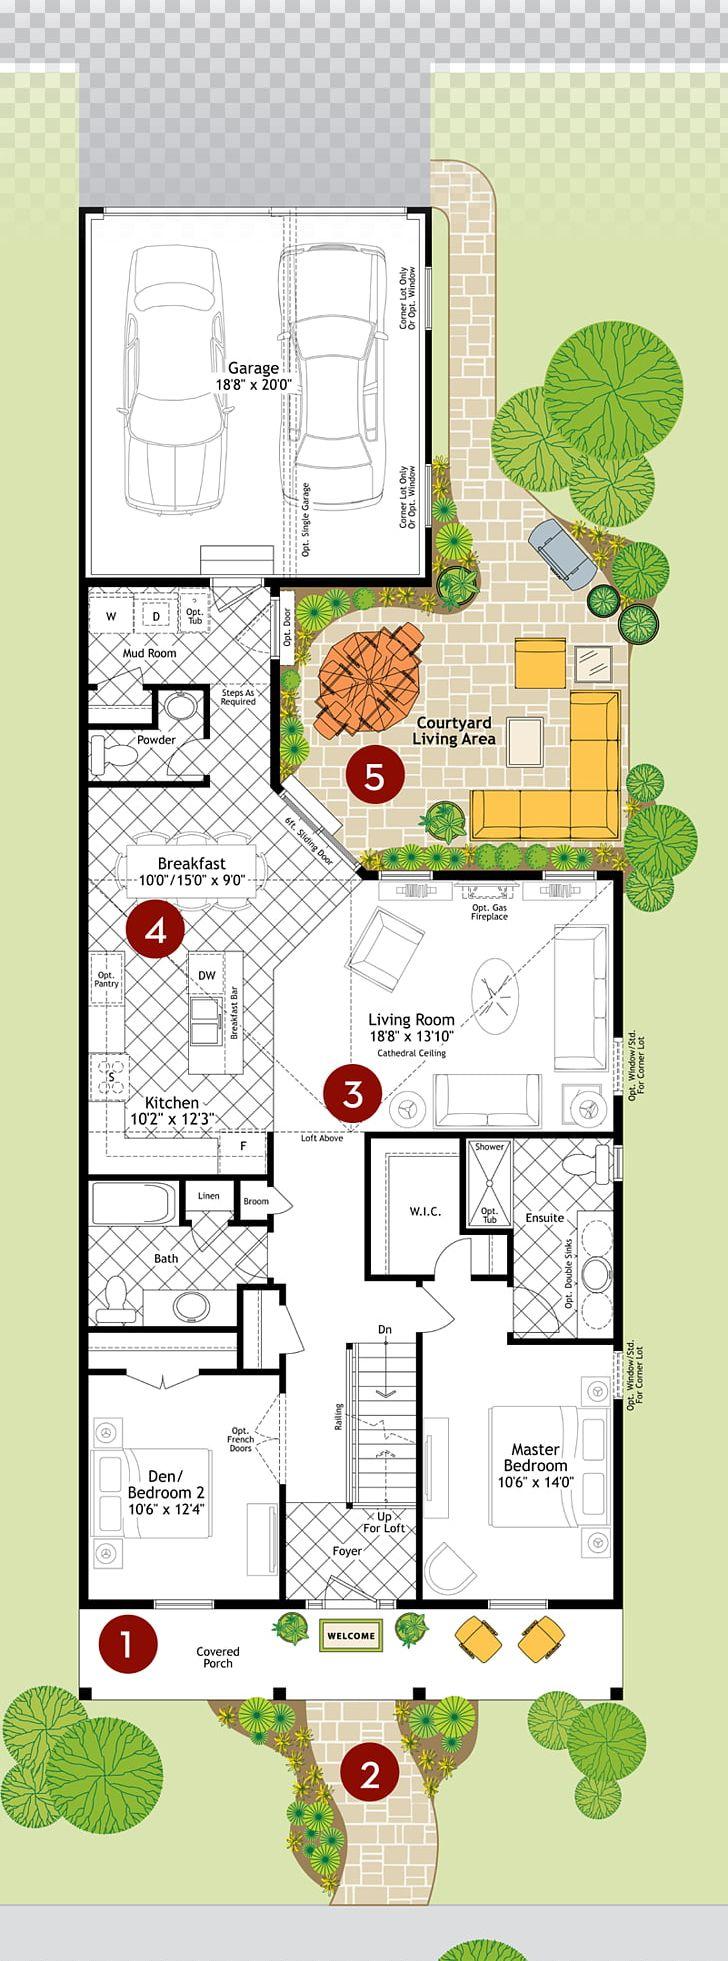 House Courtyard Garage Floor Plan Moroccan Riad PNG, Clipart.